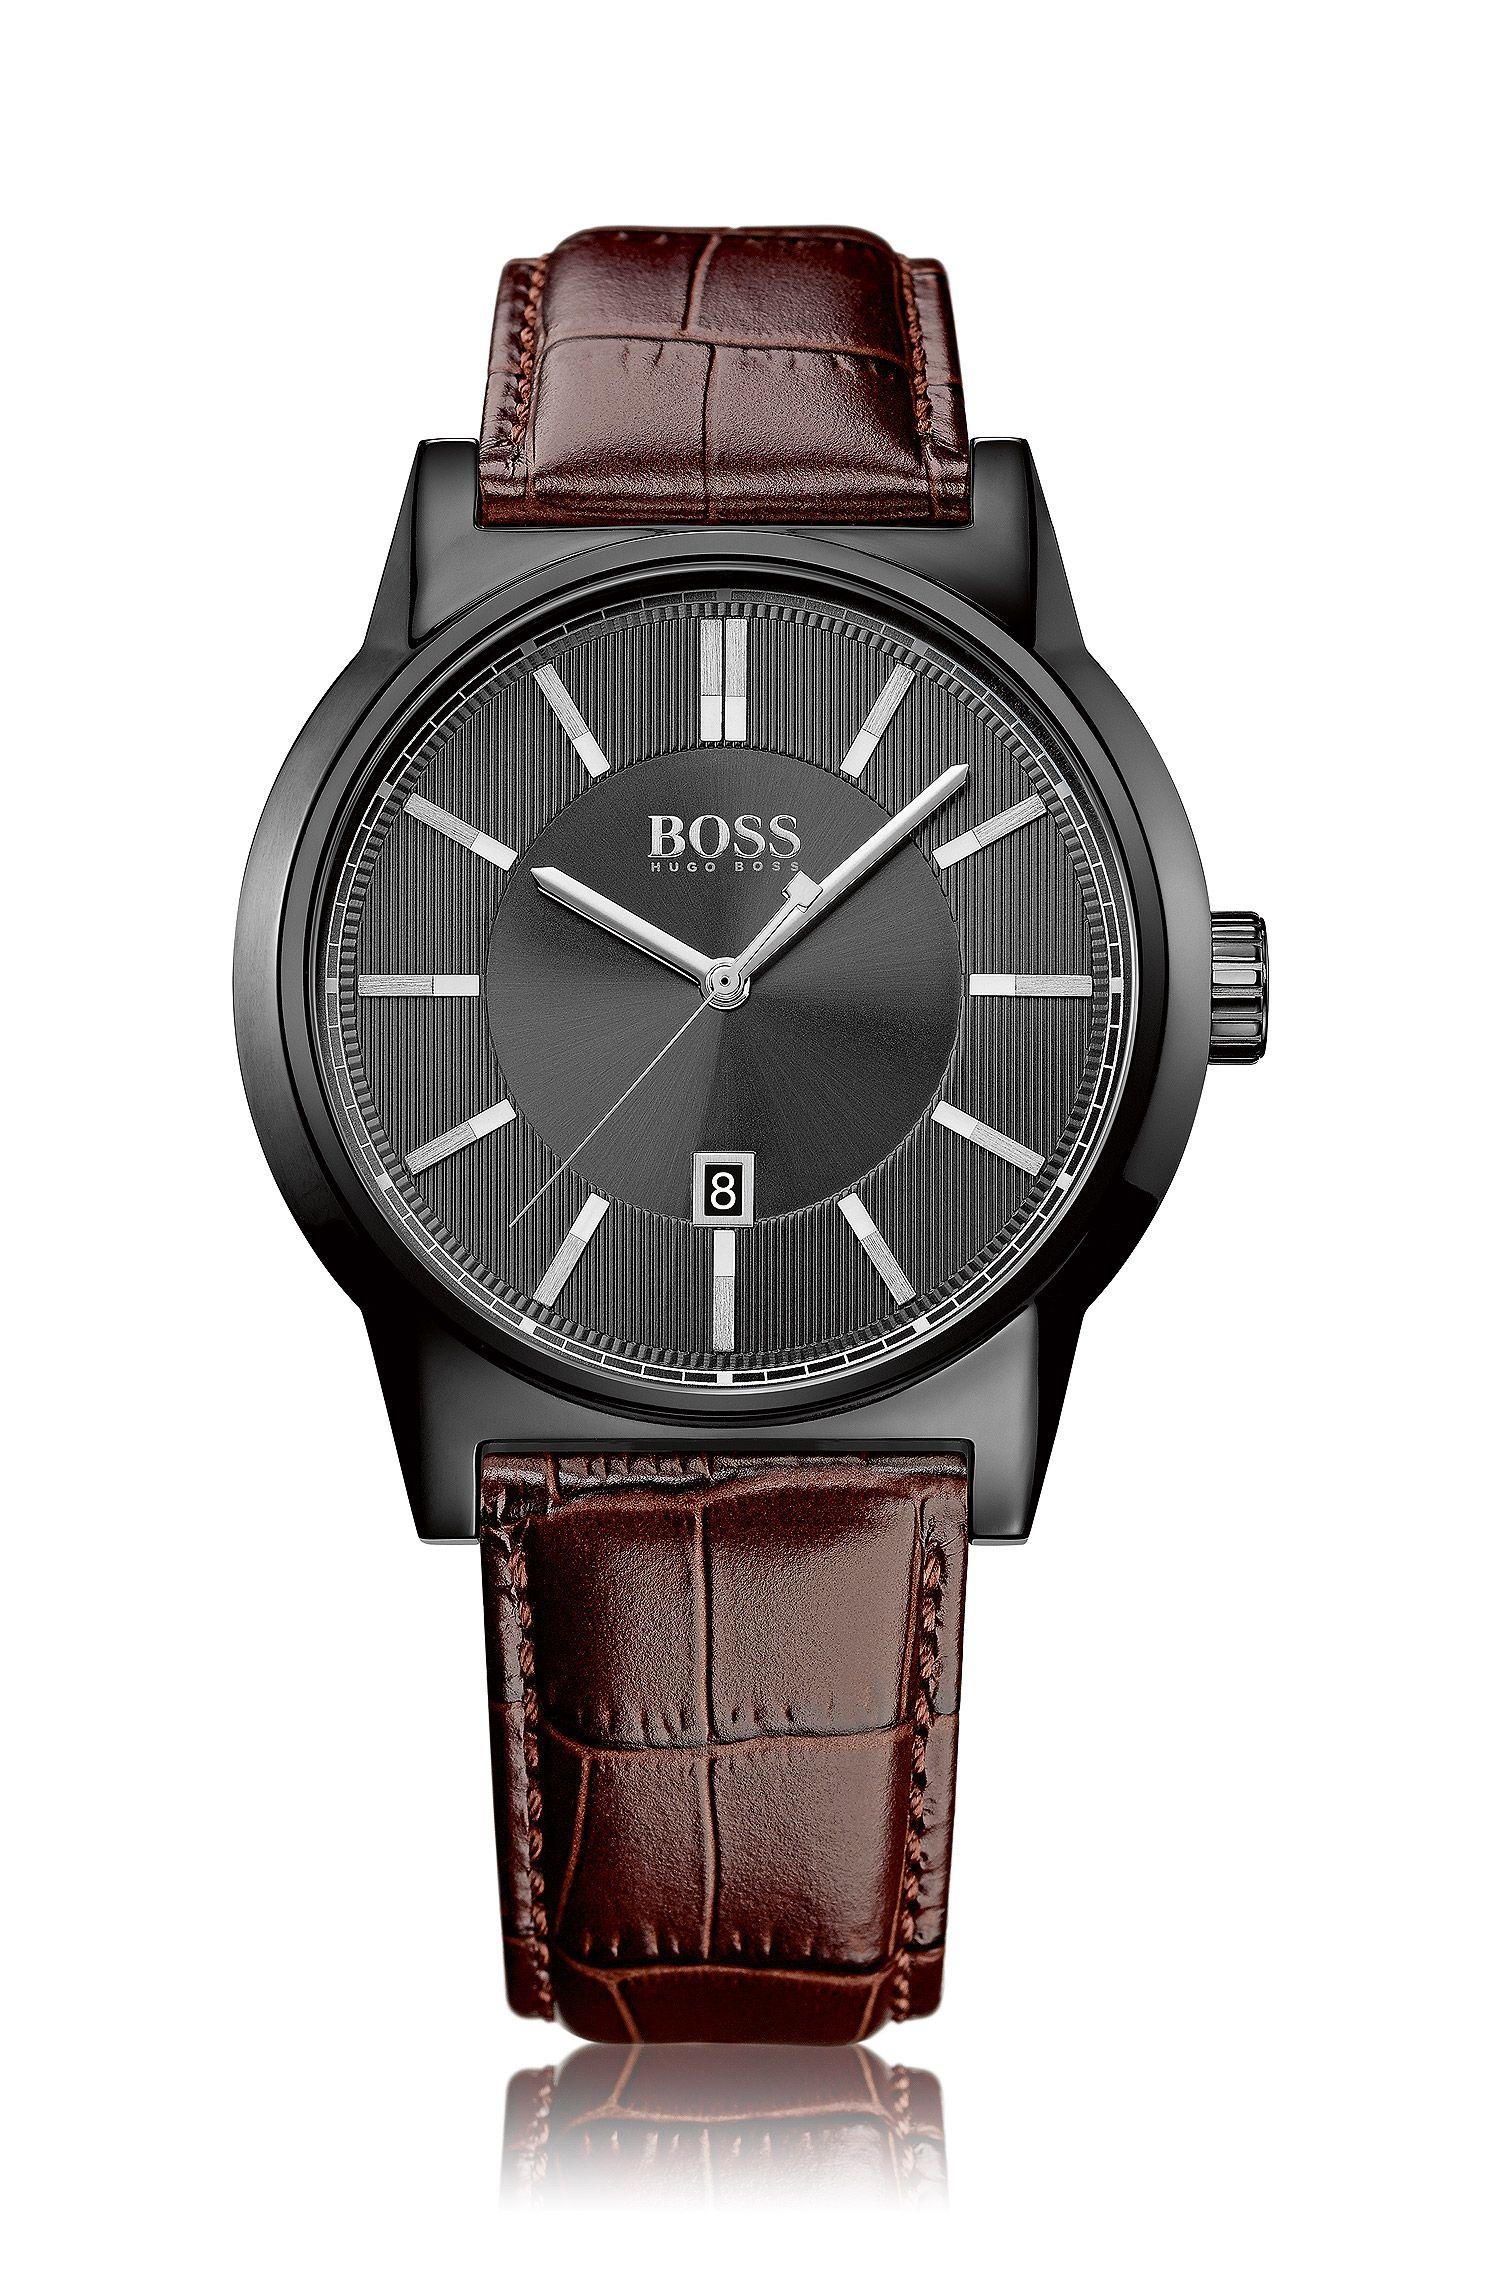 Montre-bracelet «HB6000» avec boîtier en acier inoxydable